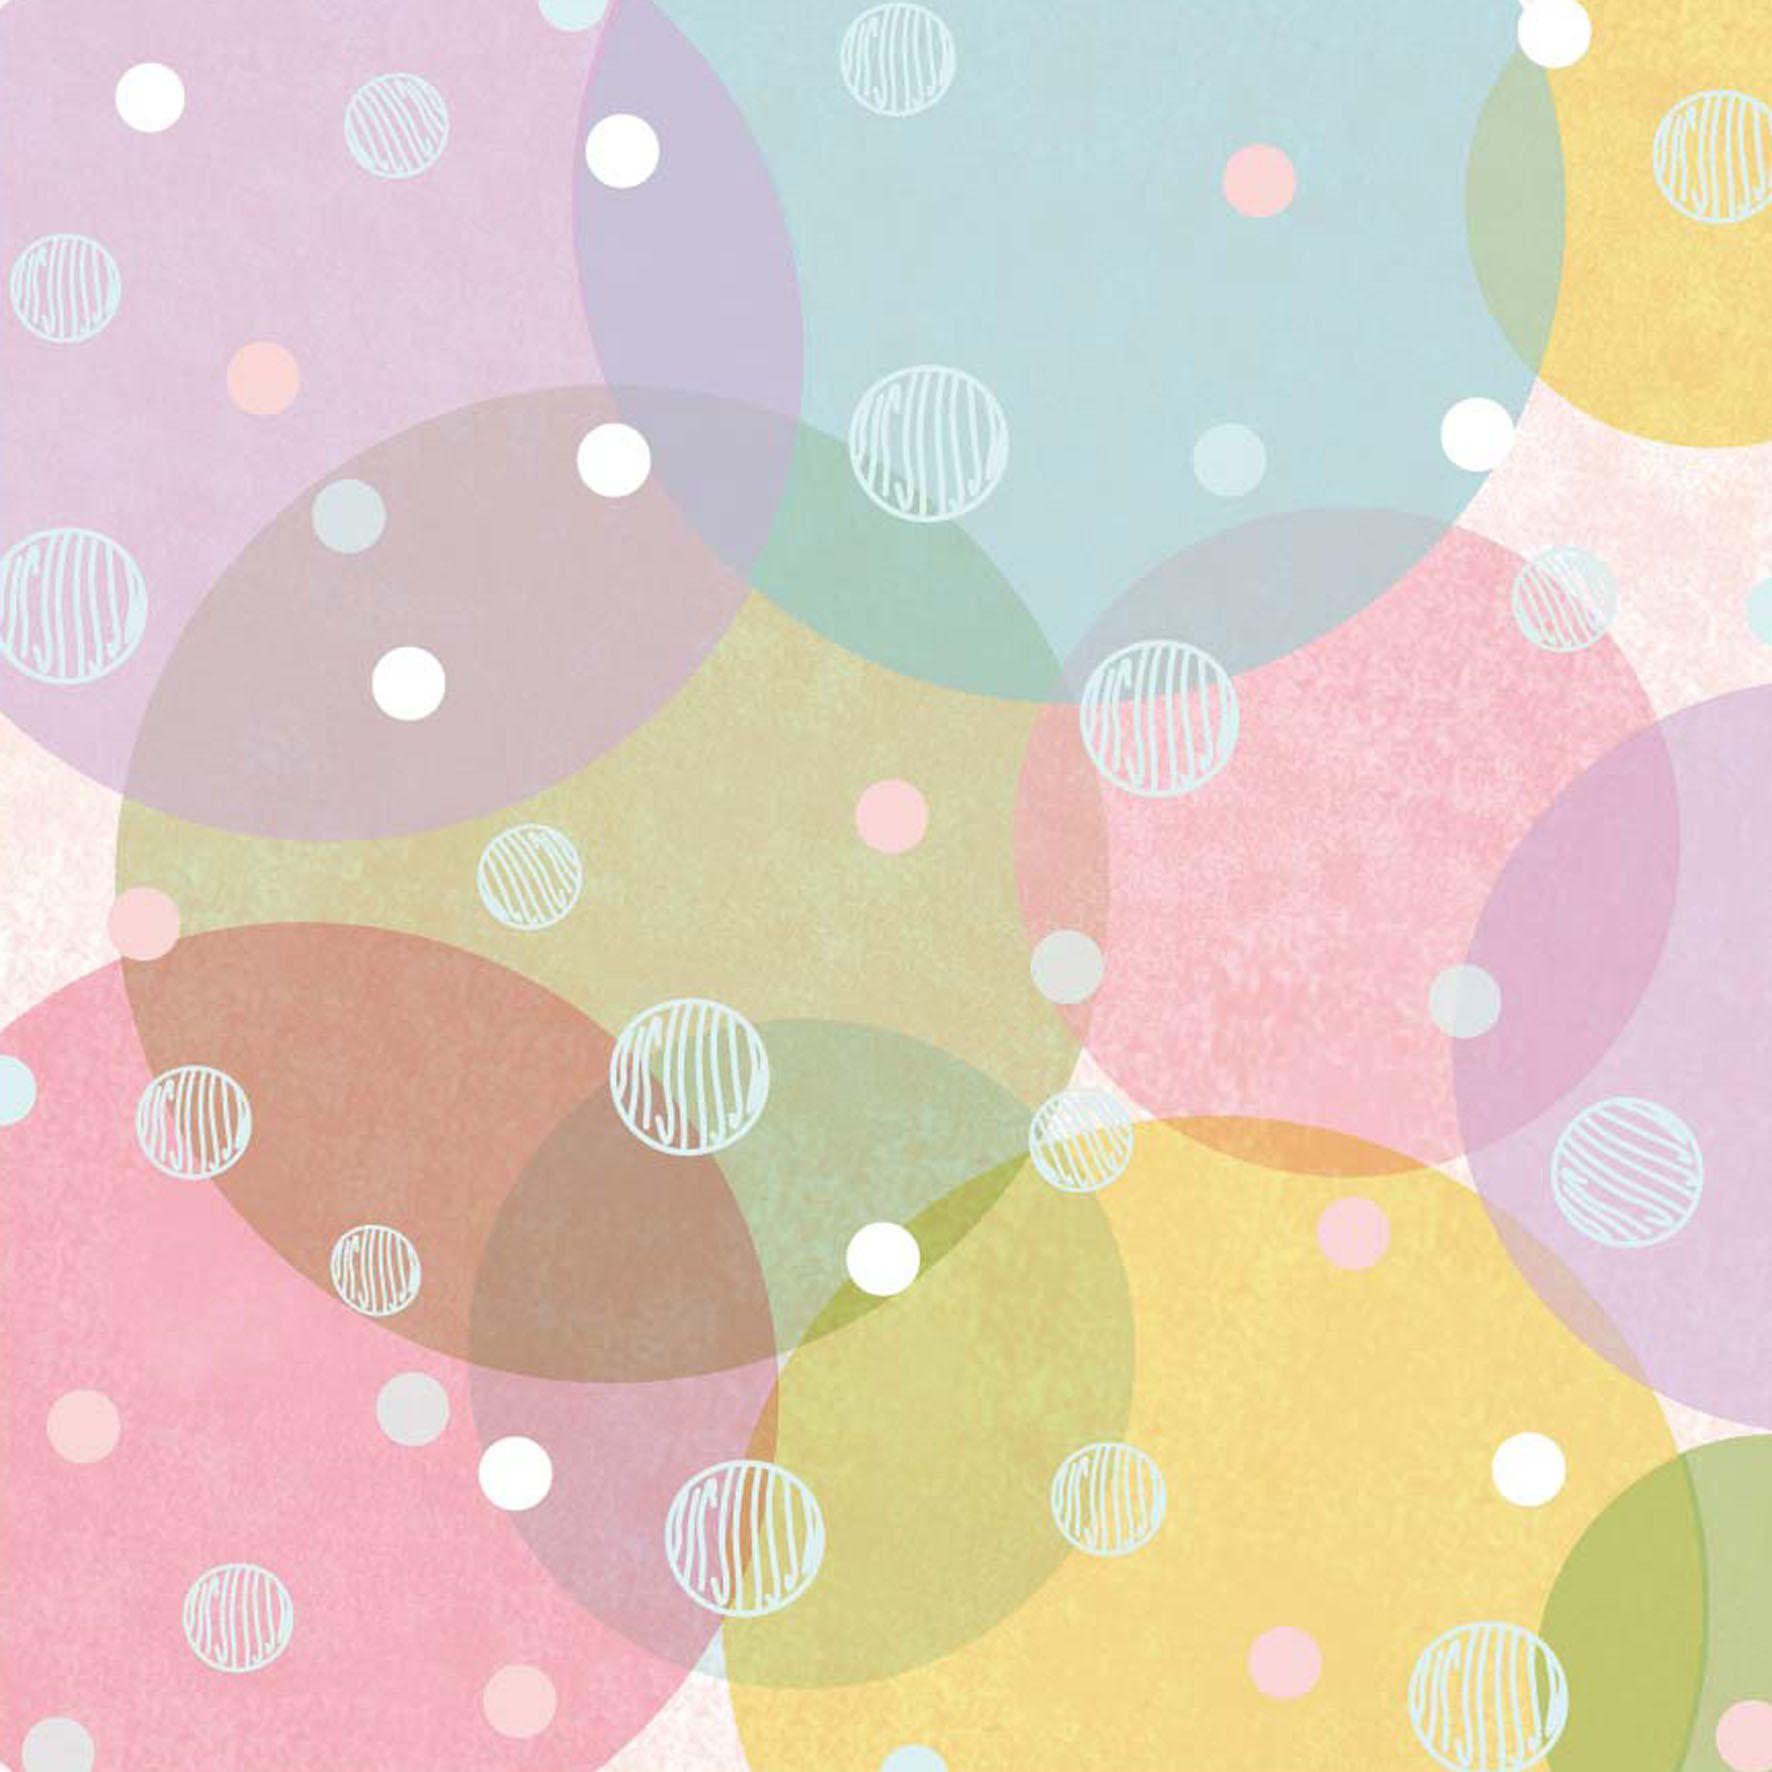 Scrapbook paper designs - Free Printable Disney Scrapbook Paper Mel Stampz Pierced Paper Patterns With Faux Enamel